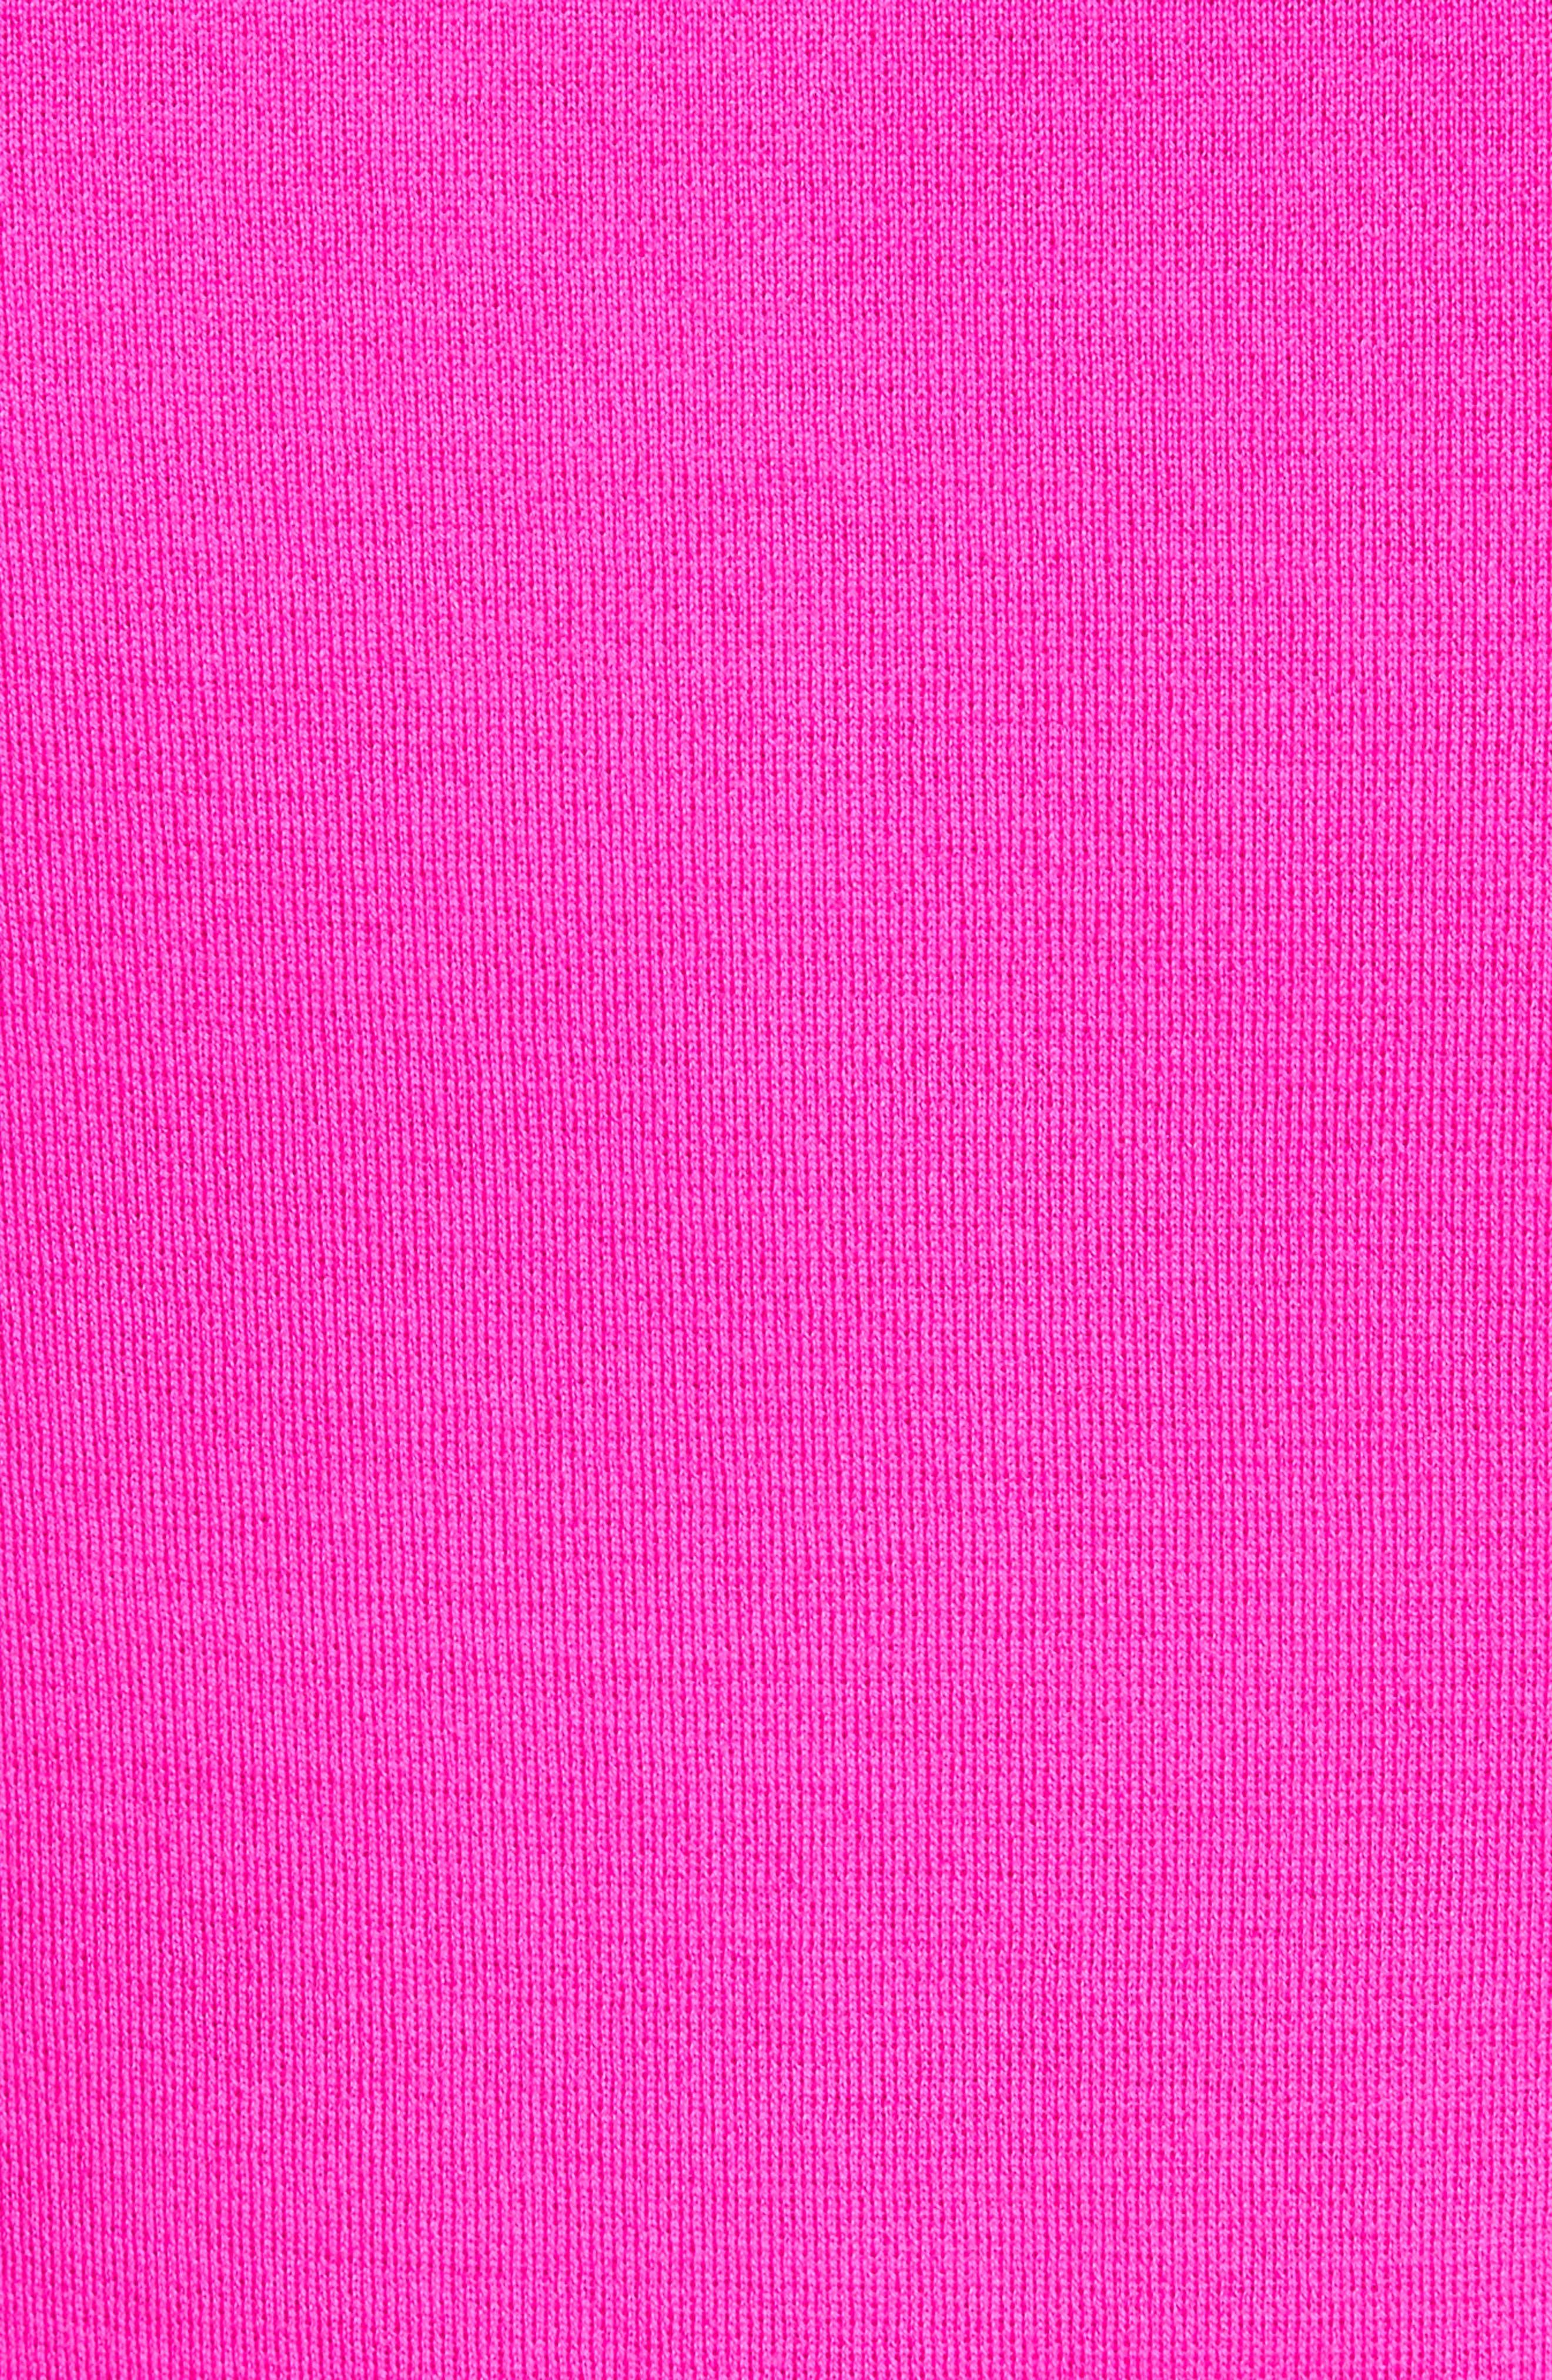 Milano Knit Contour Shell,                             Alternate thumbnail 5, color,                             600